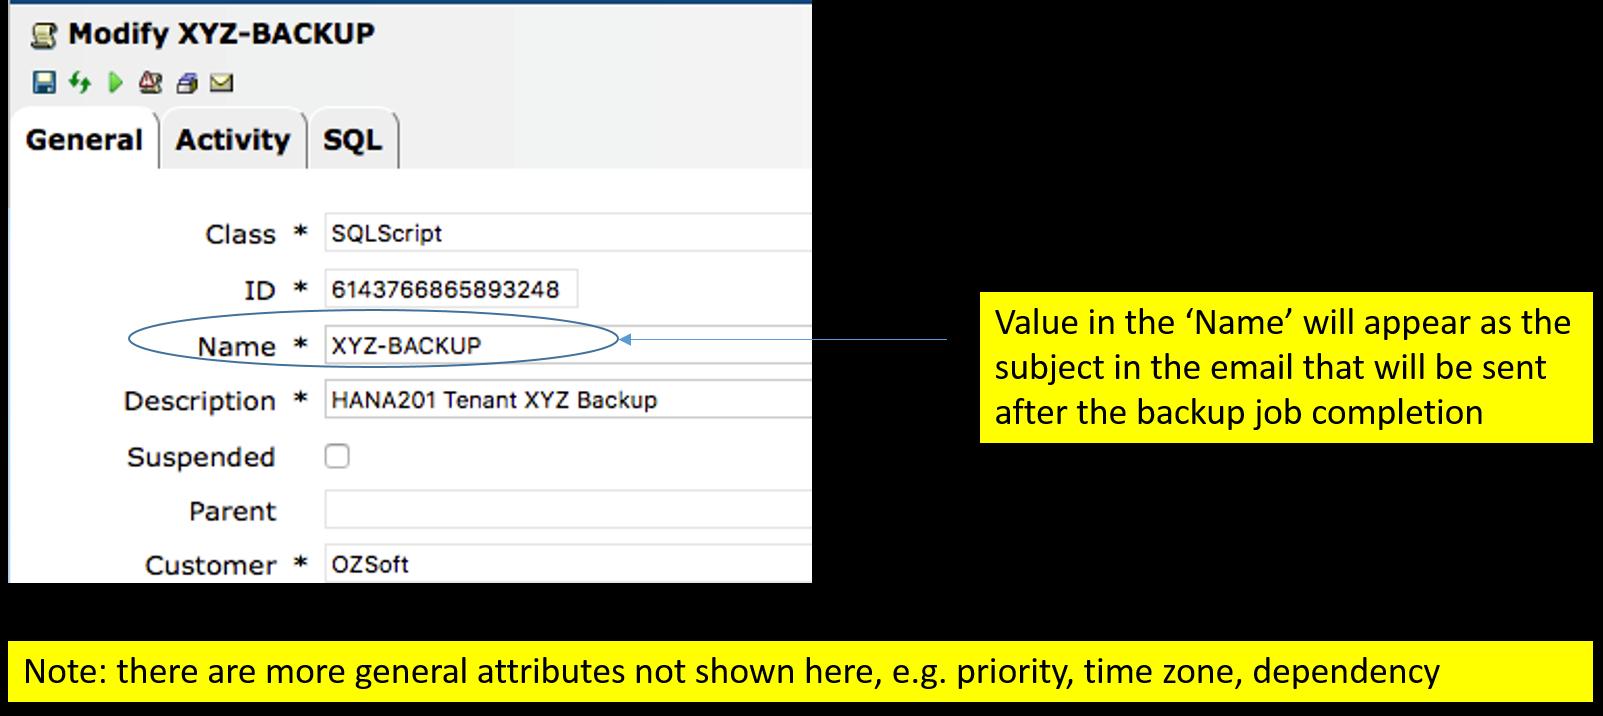 IT-Conductor SAP Basis Automation HANA Backup Create SQL Job - General Section